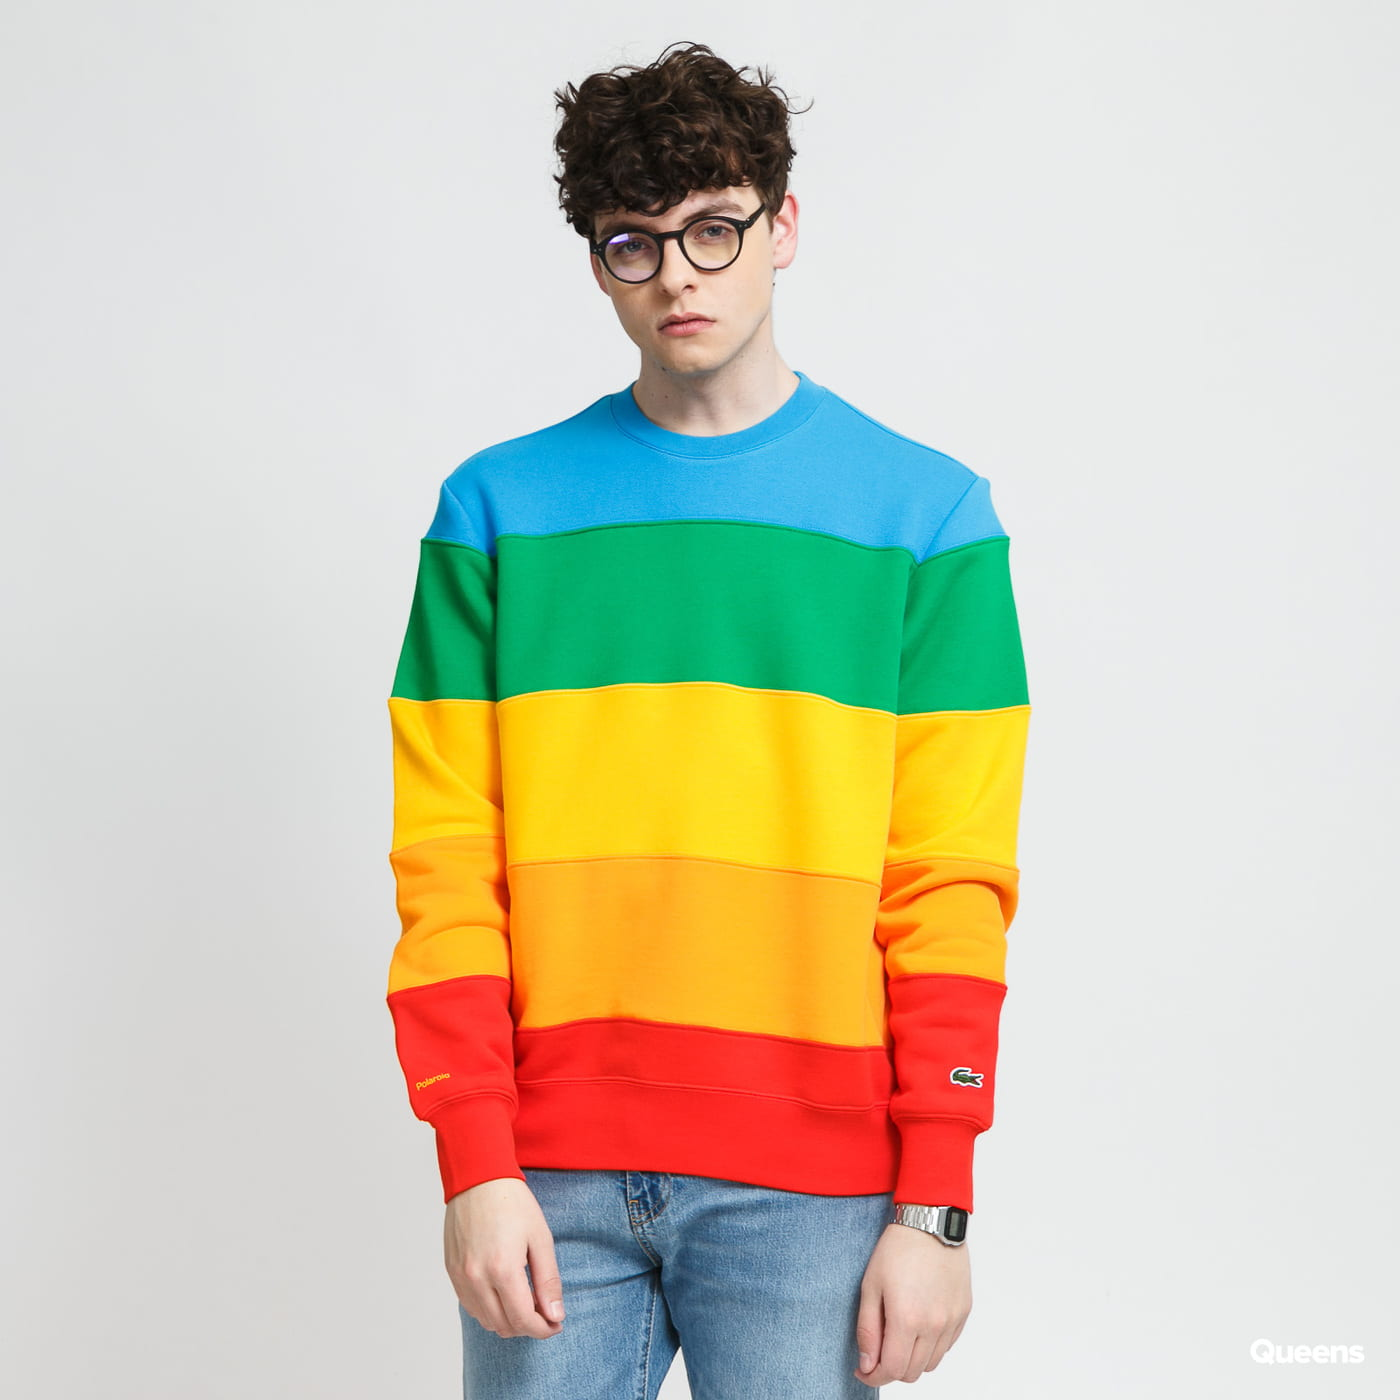 LACOSTE Men's Lacoste x Polaroid Colour Striped Fleece Sweatshirt multicolor